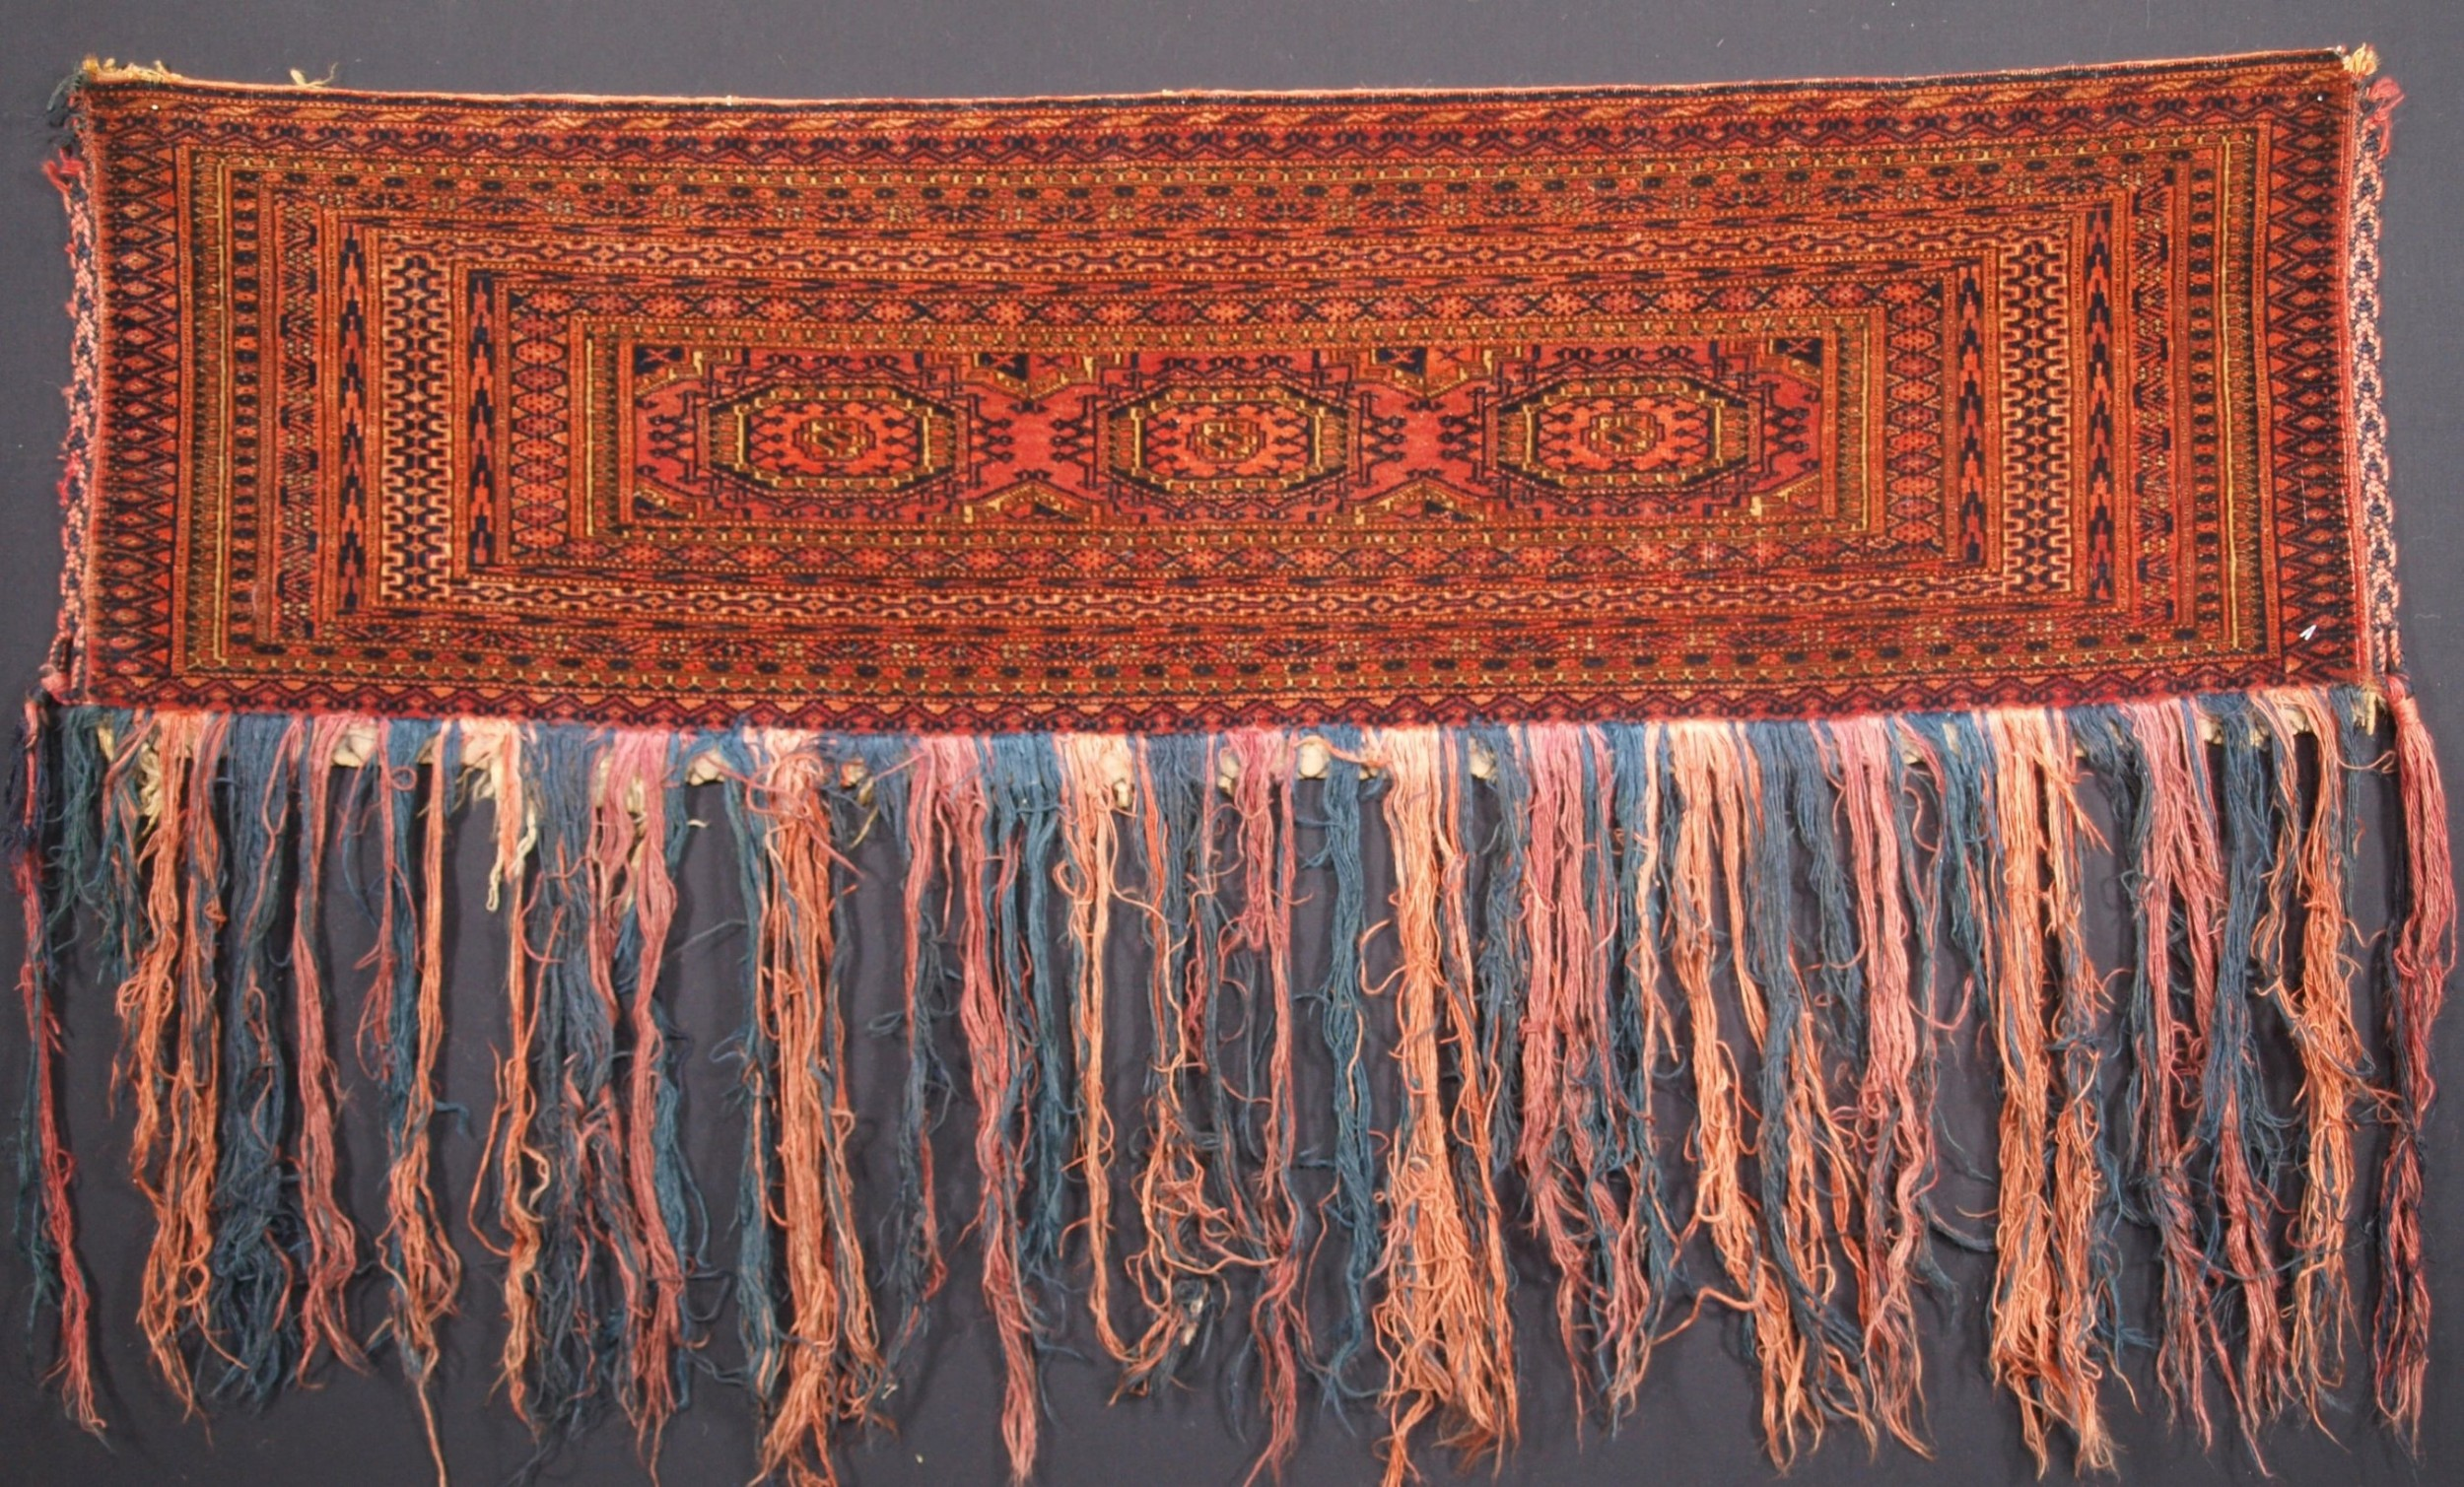 antique tekke turkmen torba with turreted gul design circa 1900